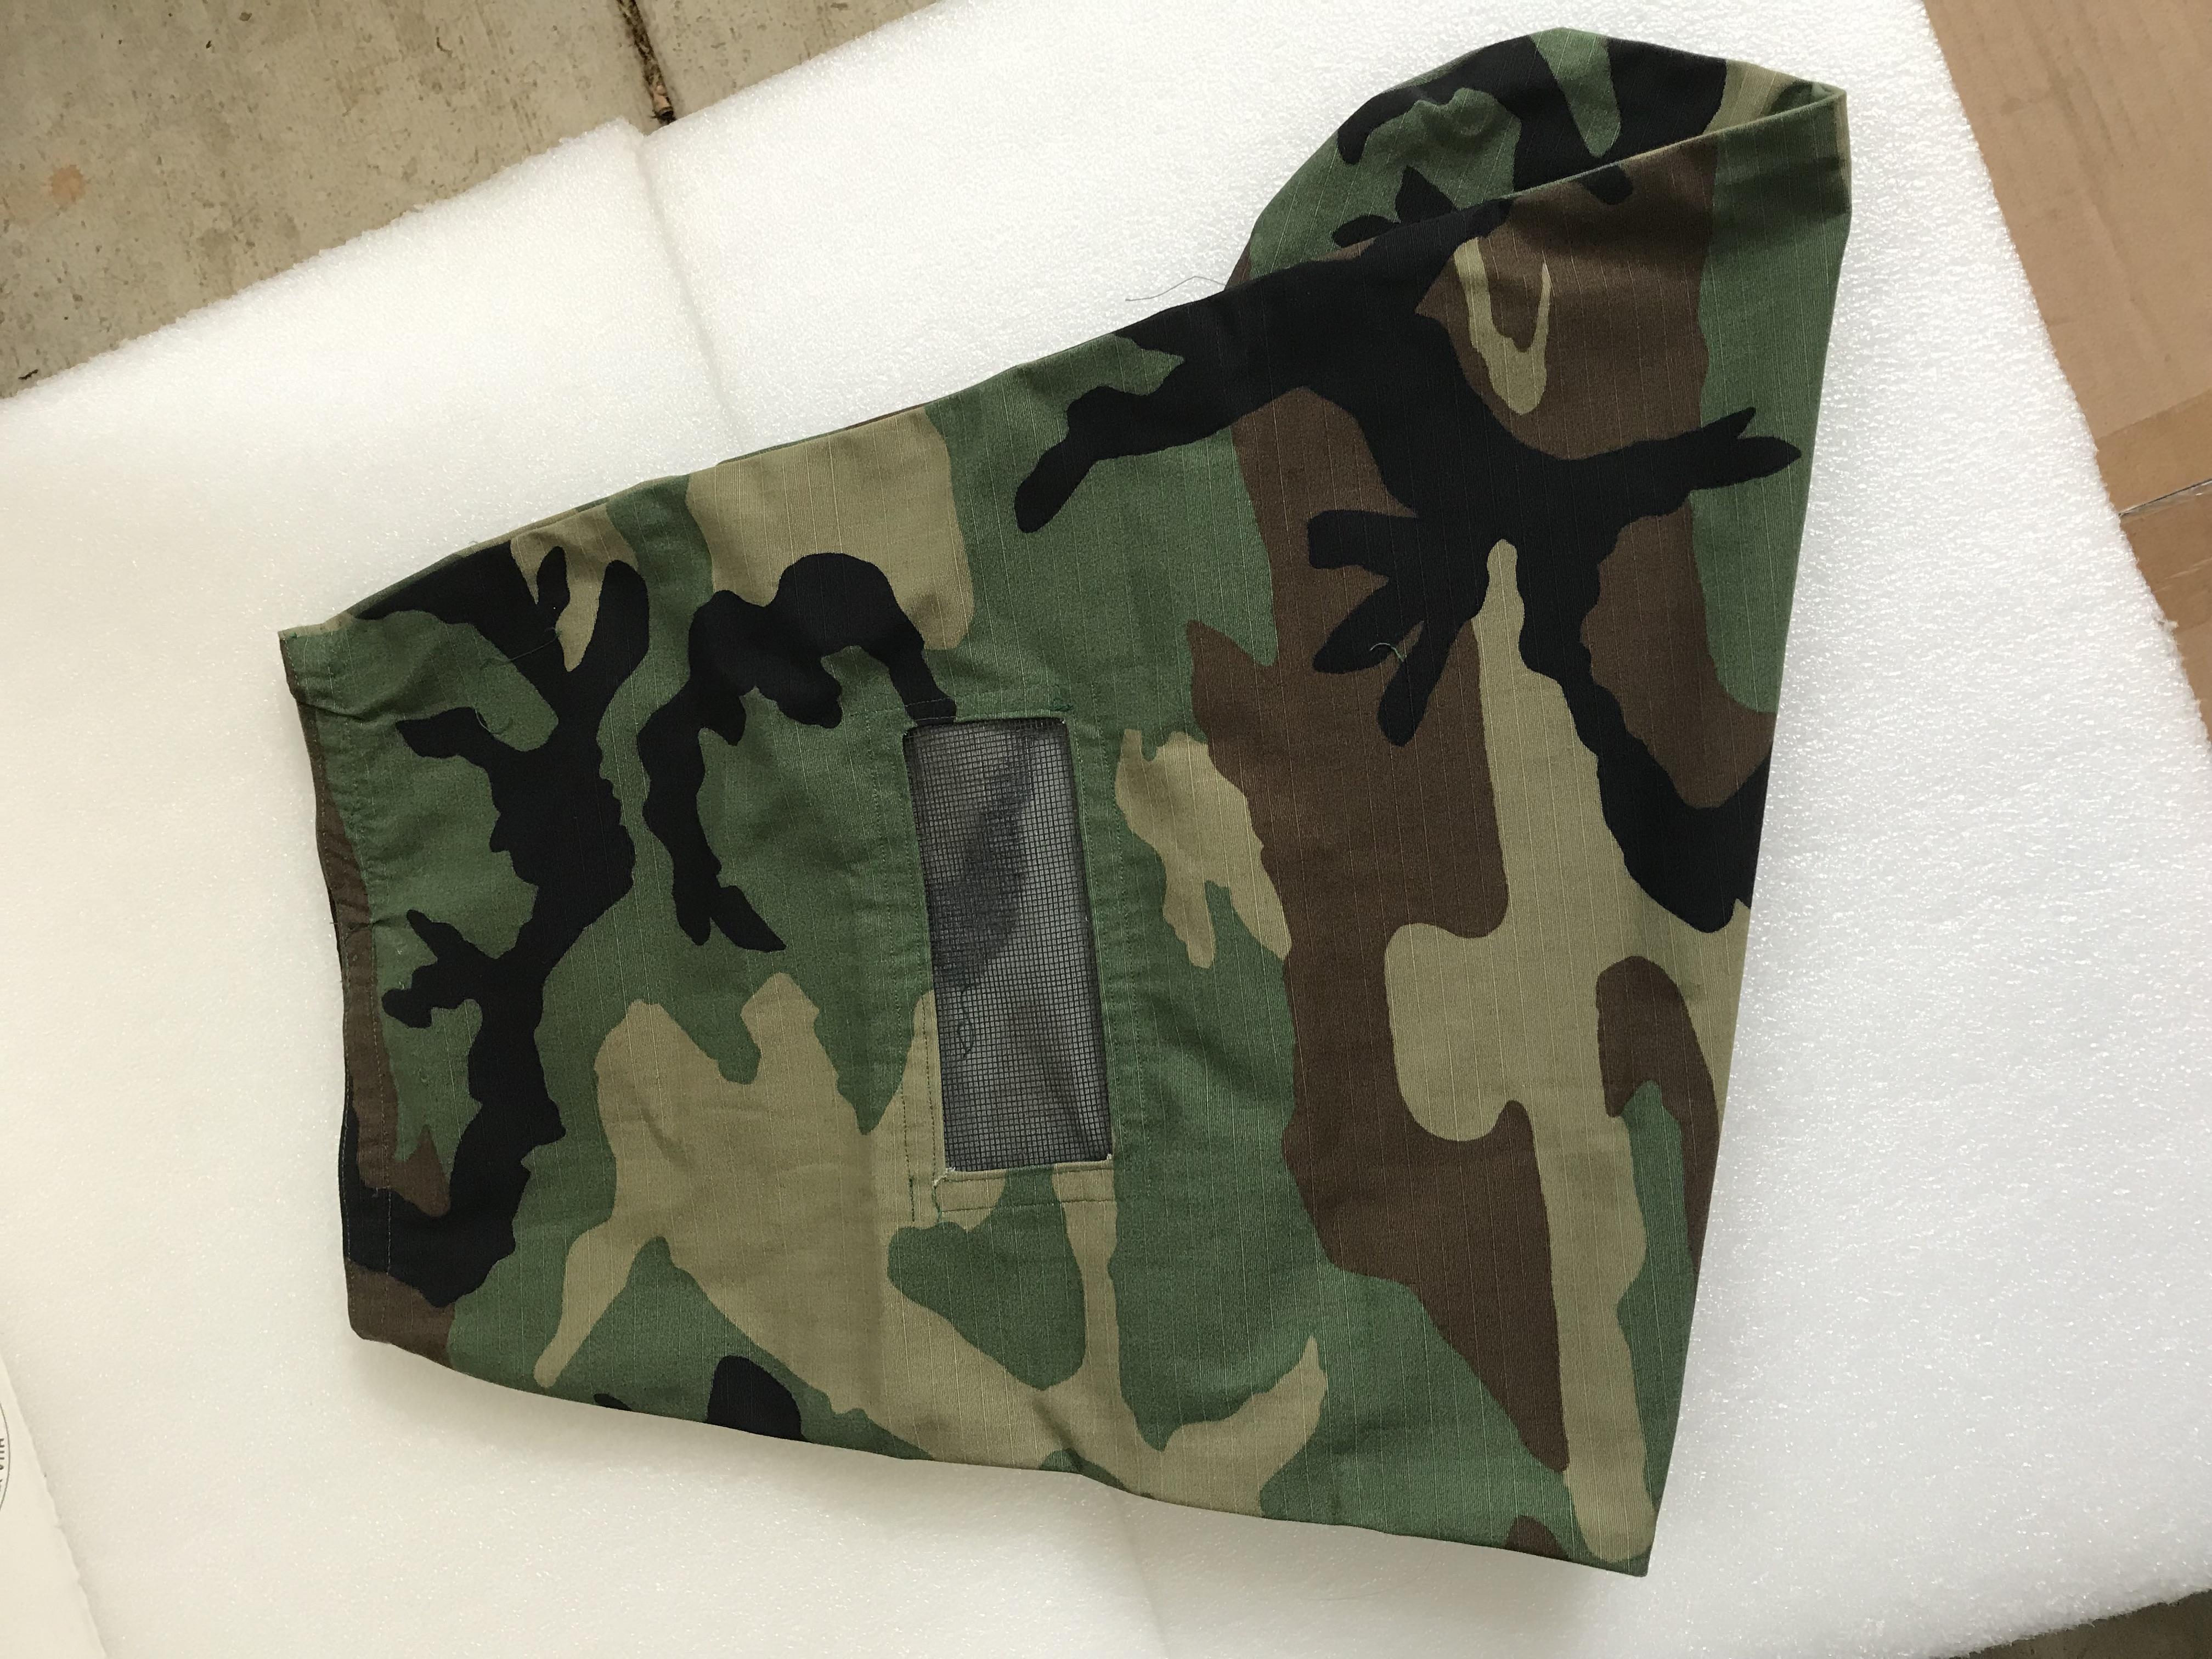 Tailing Filter Bag